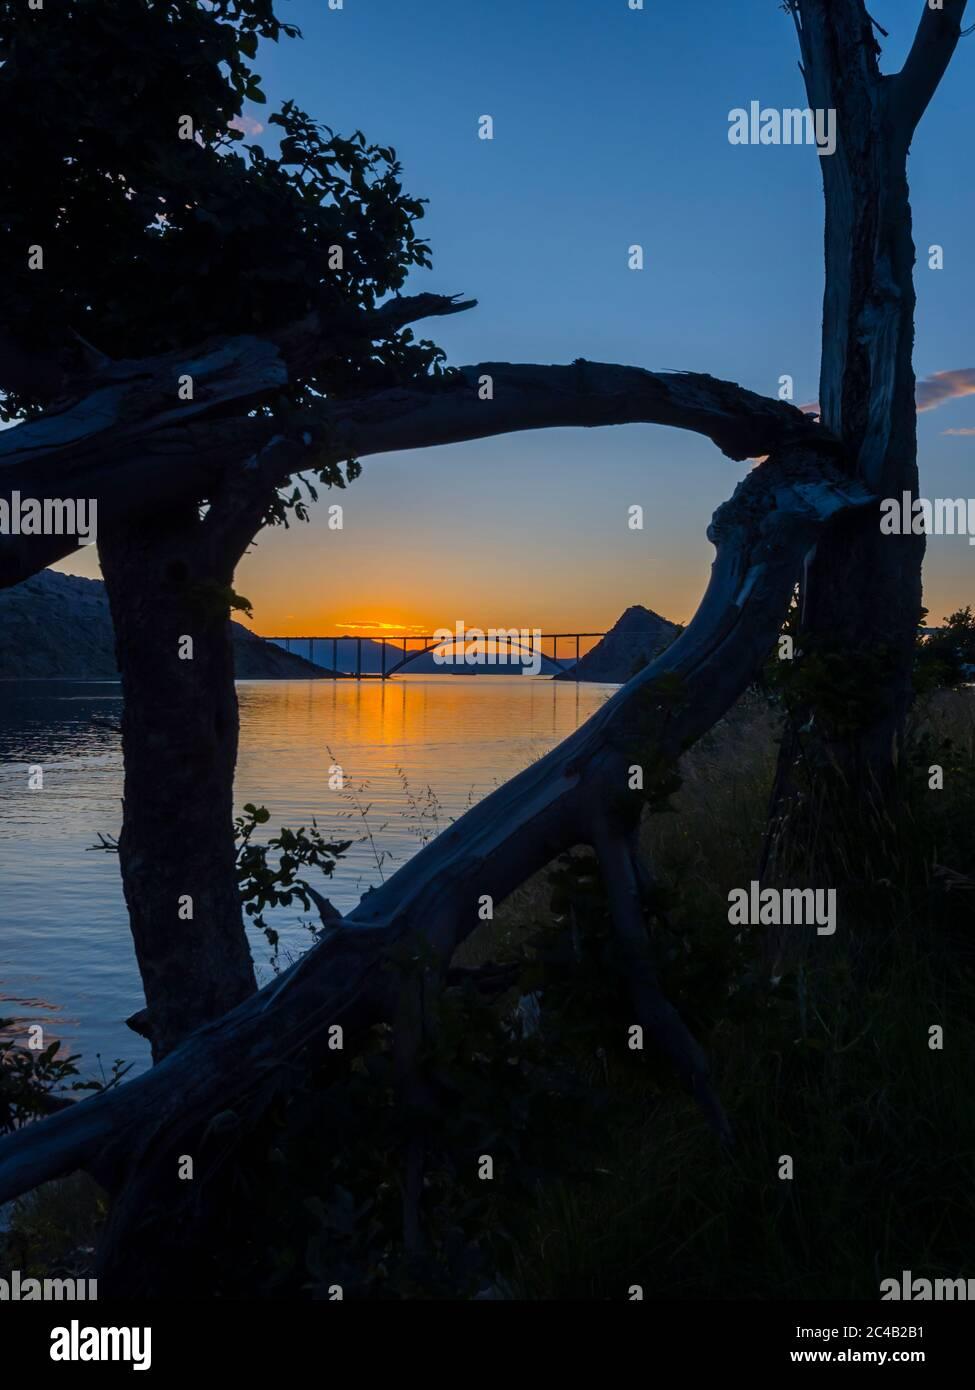 Sunset landscape silhouette silhouetting trees framed bridge mainland to island Krk Croatia Stock Photo